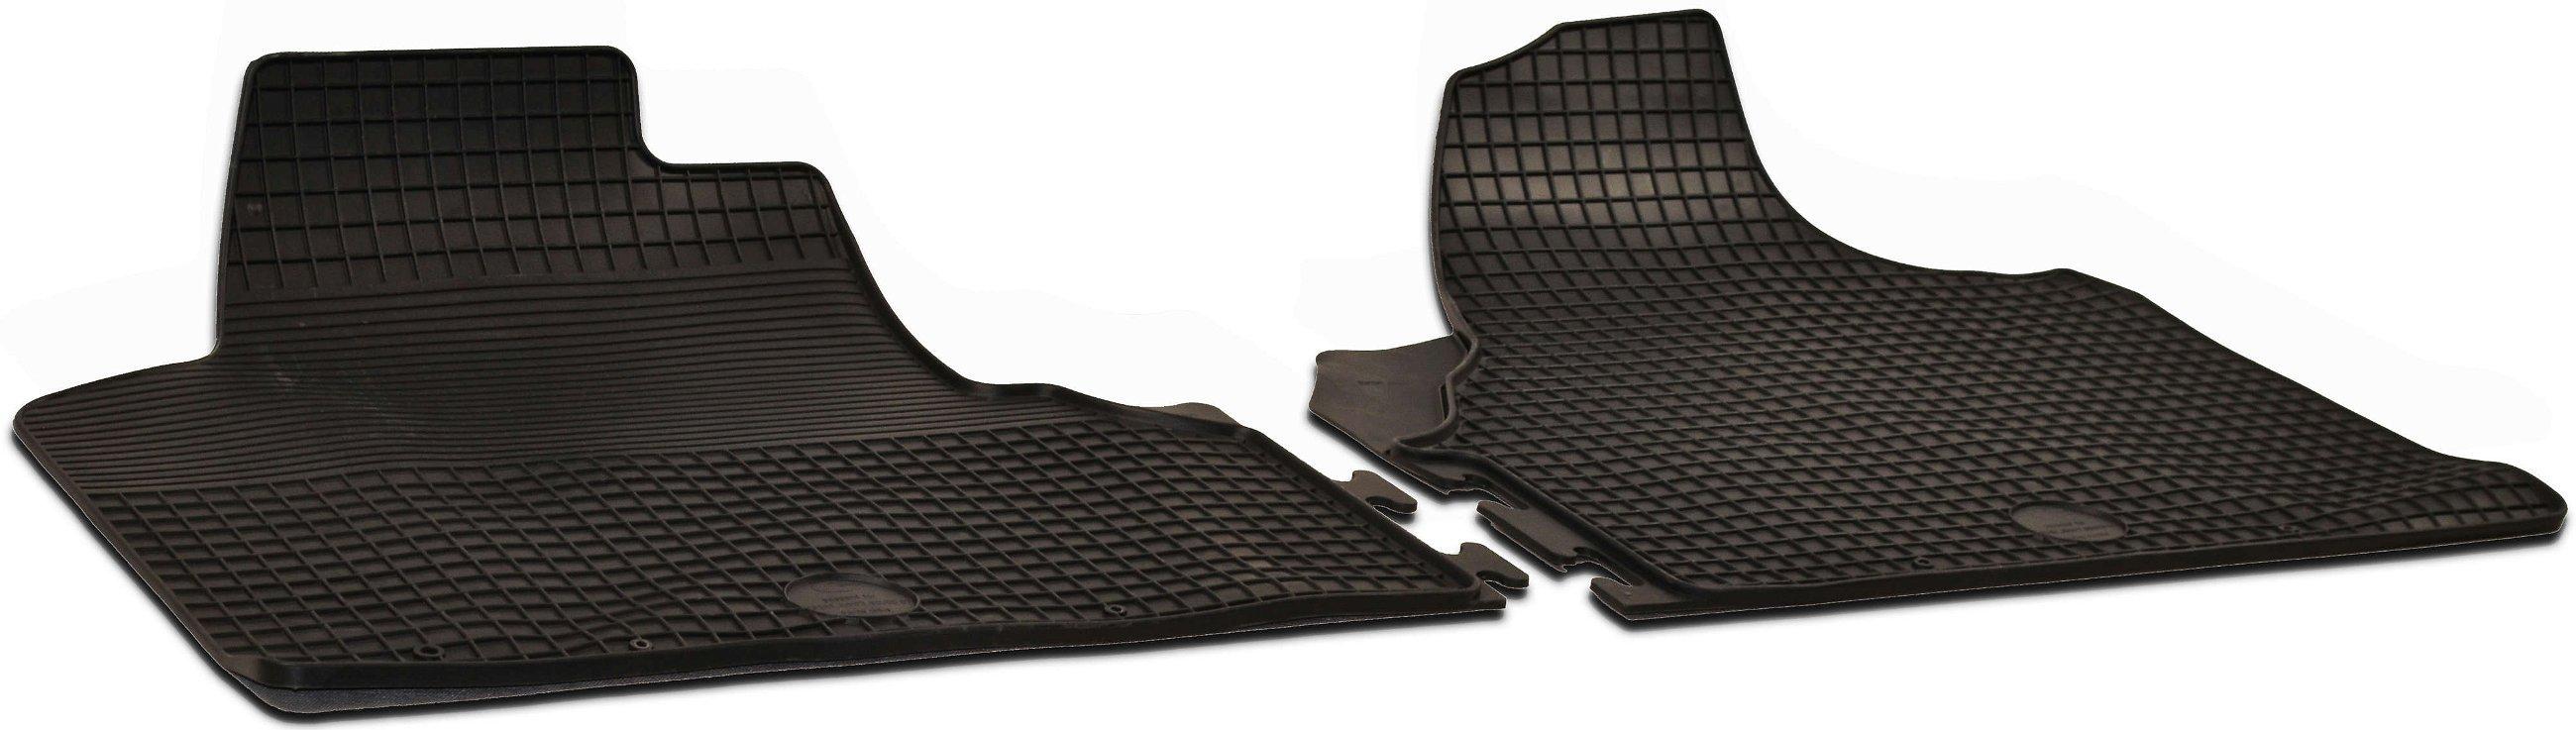 Gummi-Fußmatten+Kofferraumwanne CITROEN NEMO 2007-heute